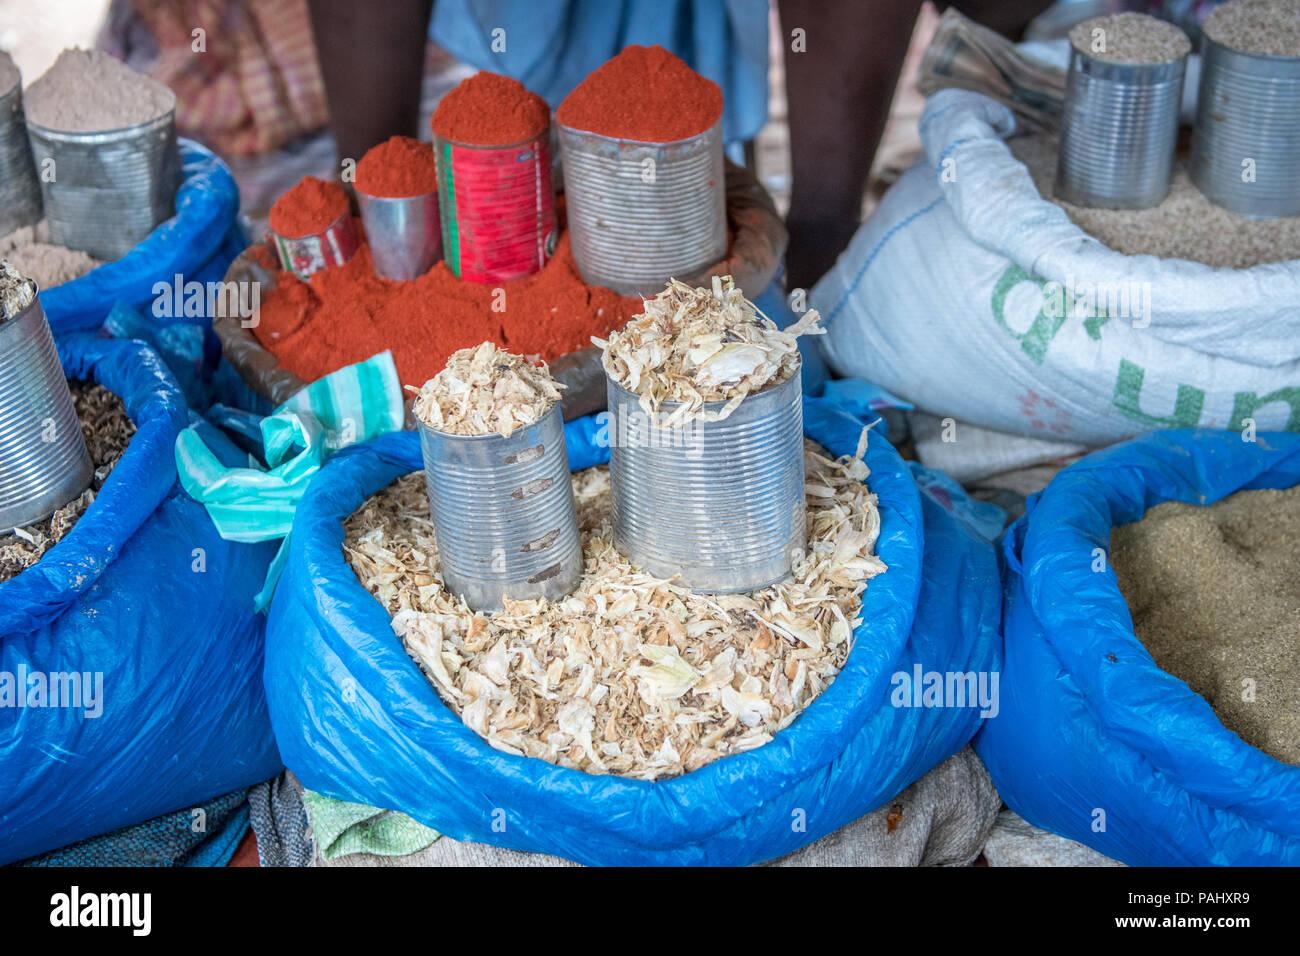 Spices piled up Ganta, Liberia - Stock Image